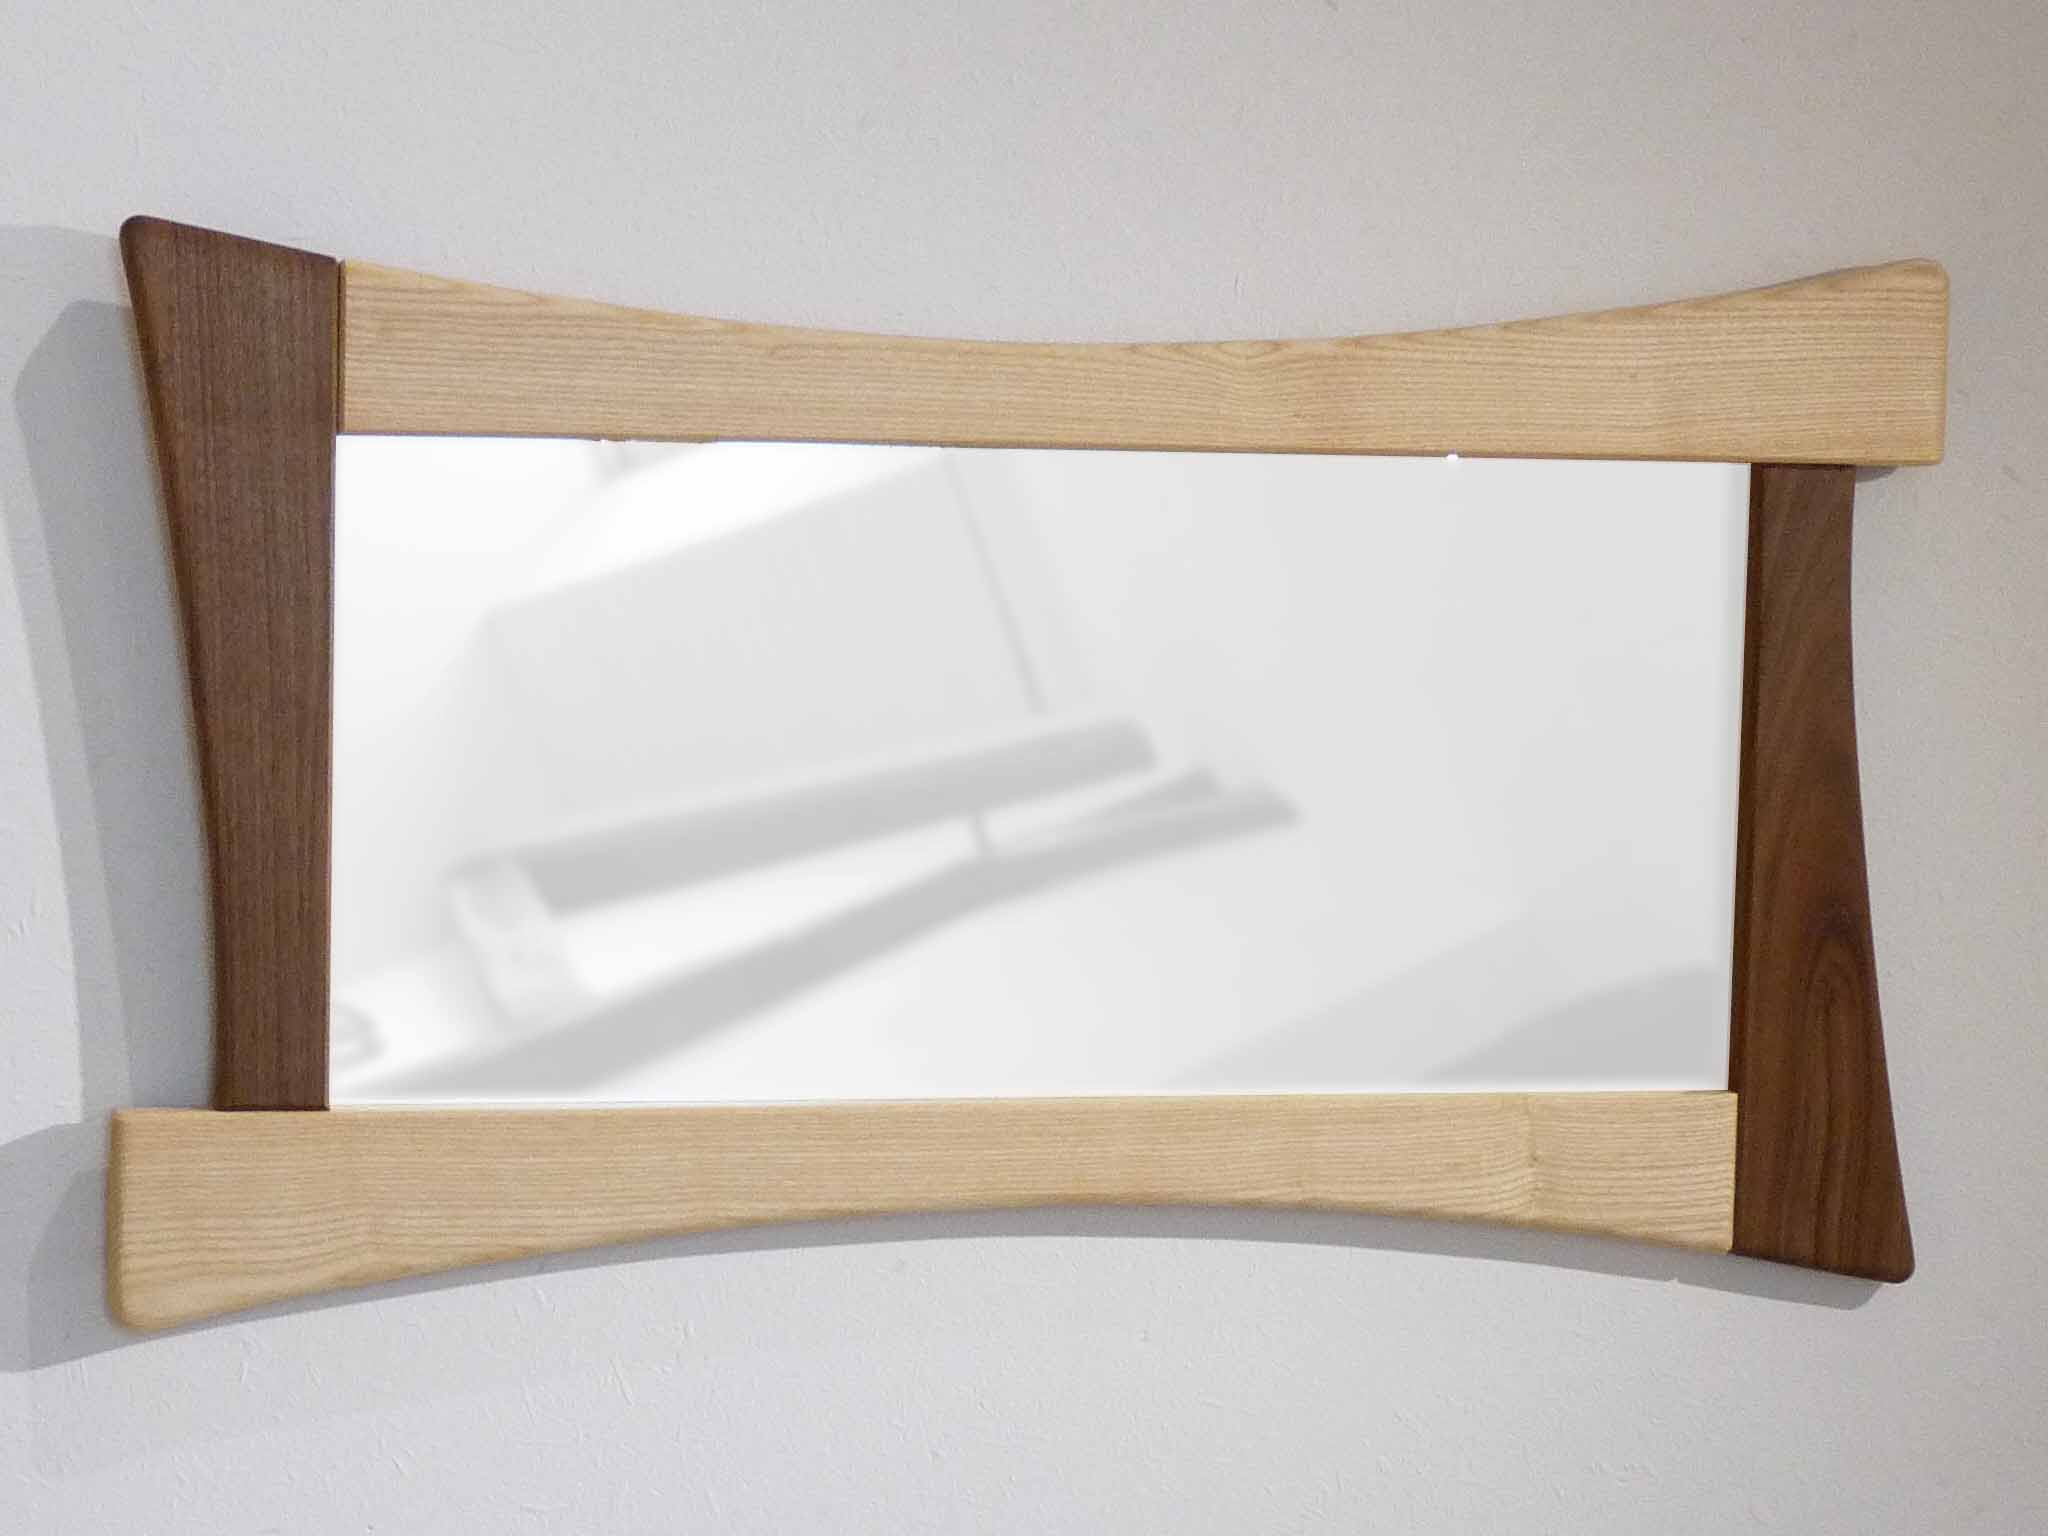 Miroir 100 x 60 cm - vue 1